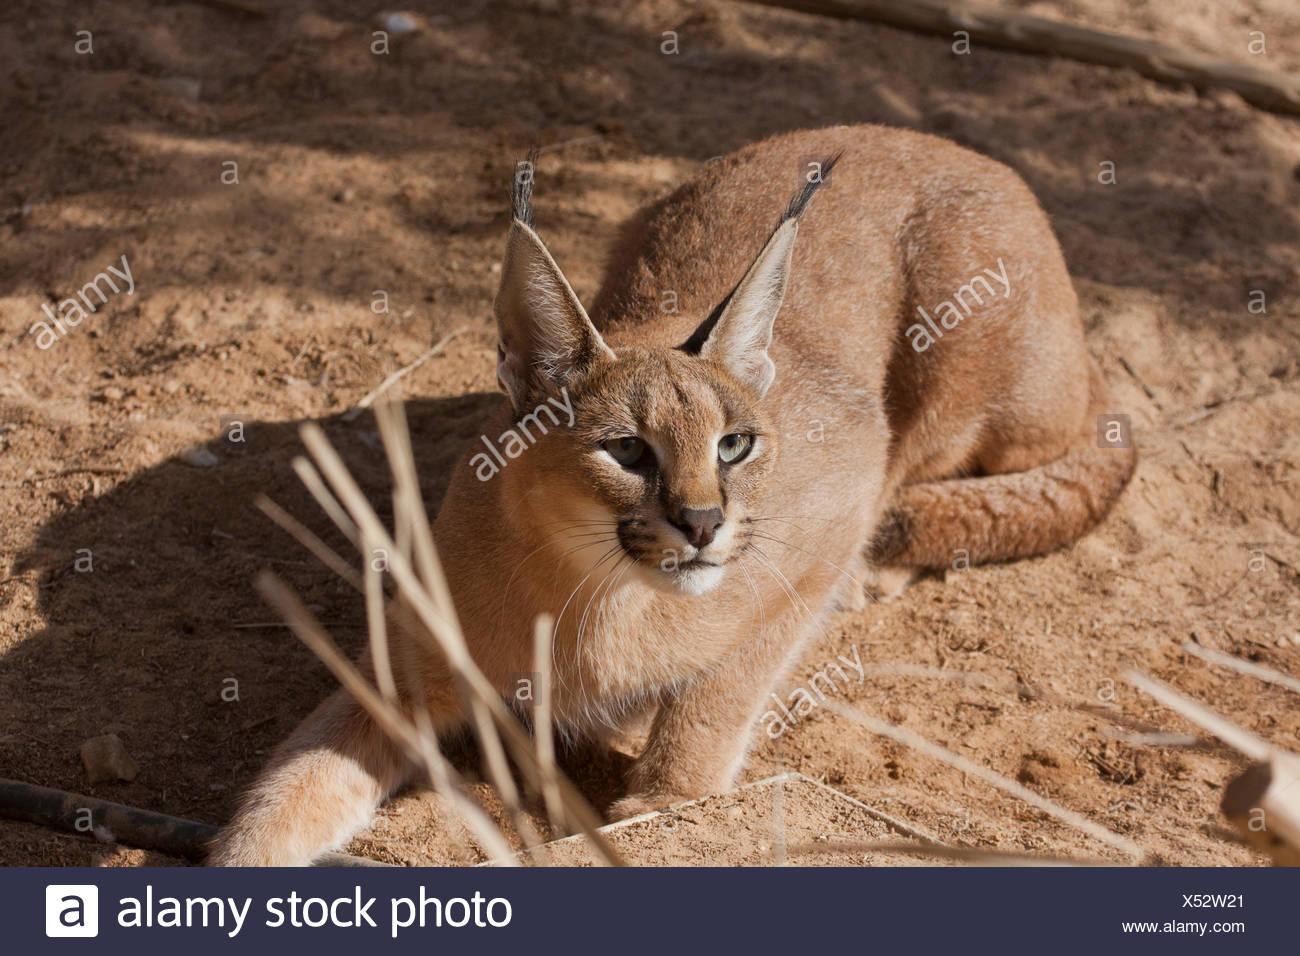 Caracal Caracal Caracal Also Known As Desert Lynx Is A Wild Cat